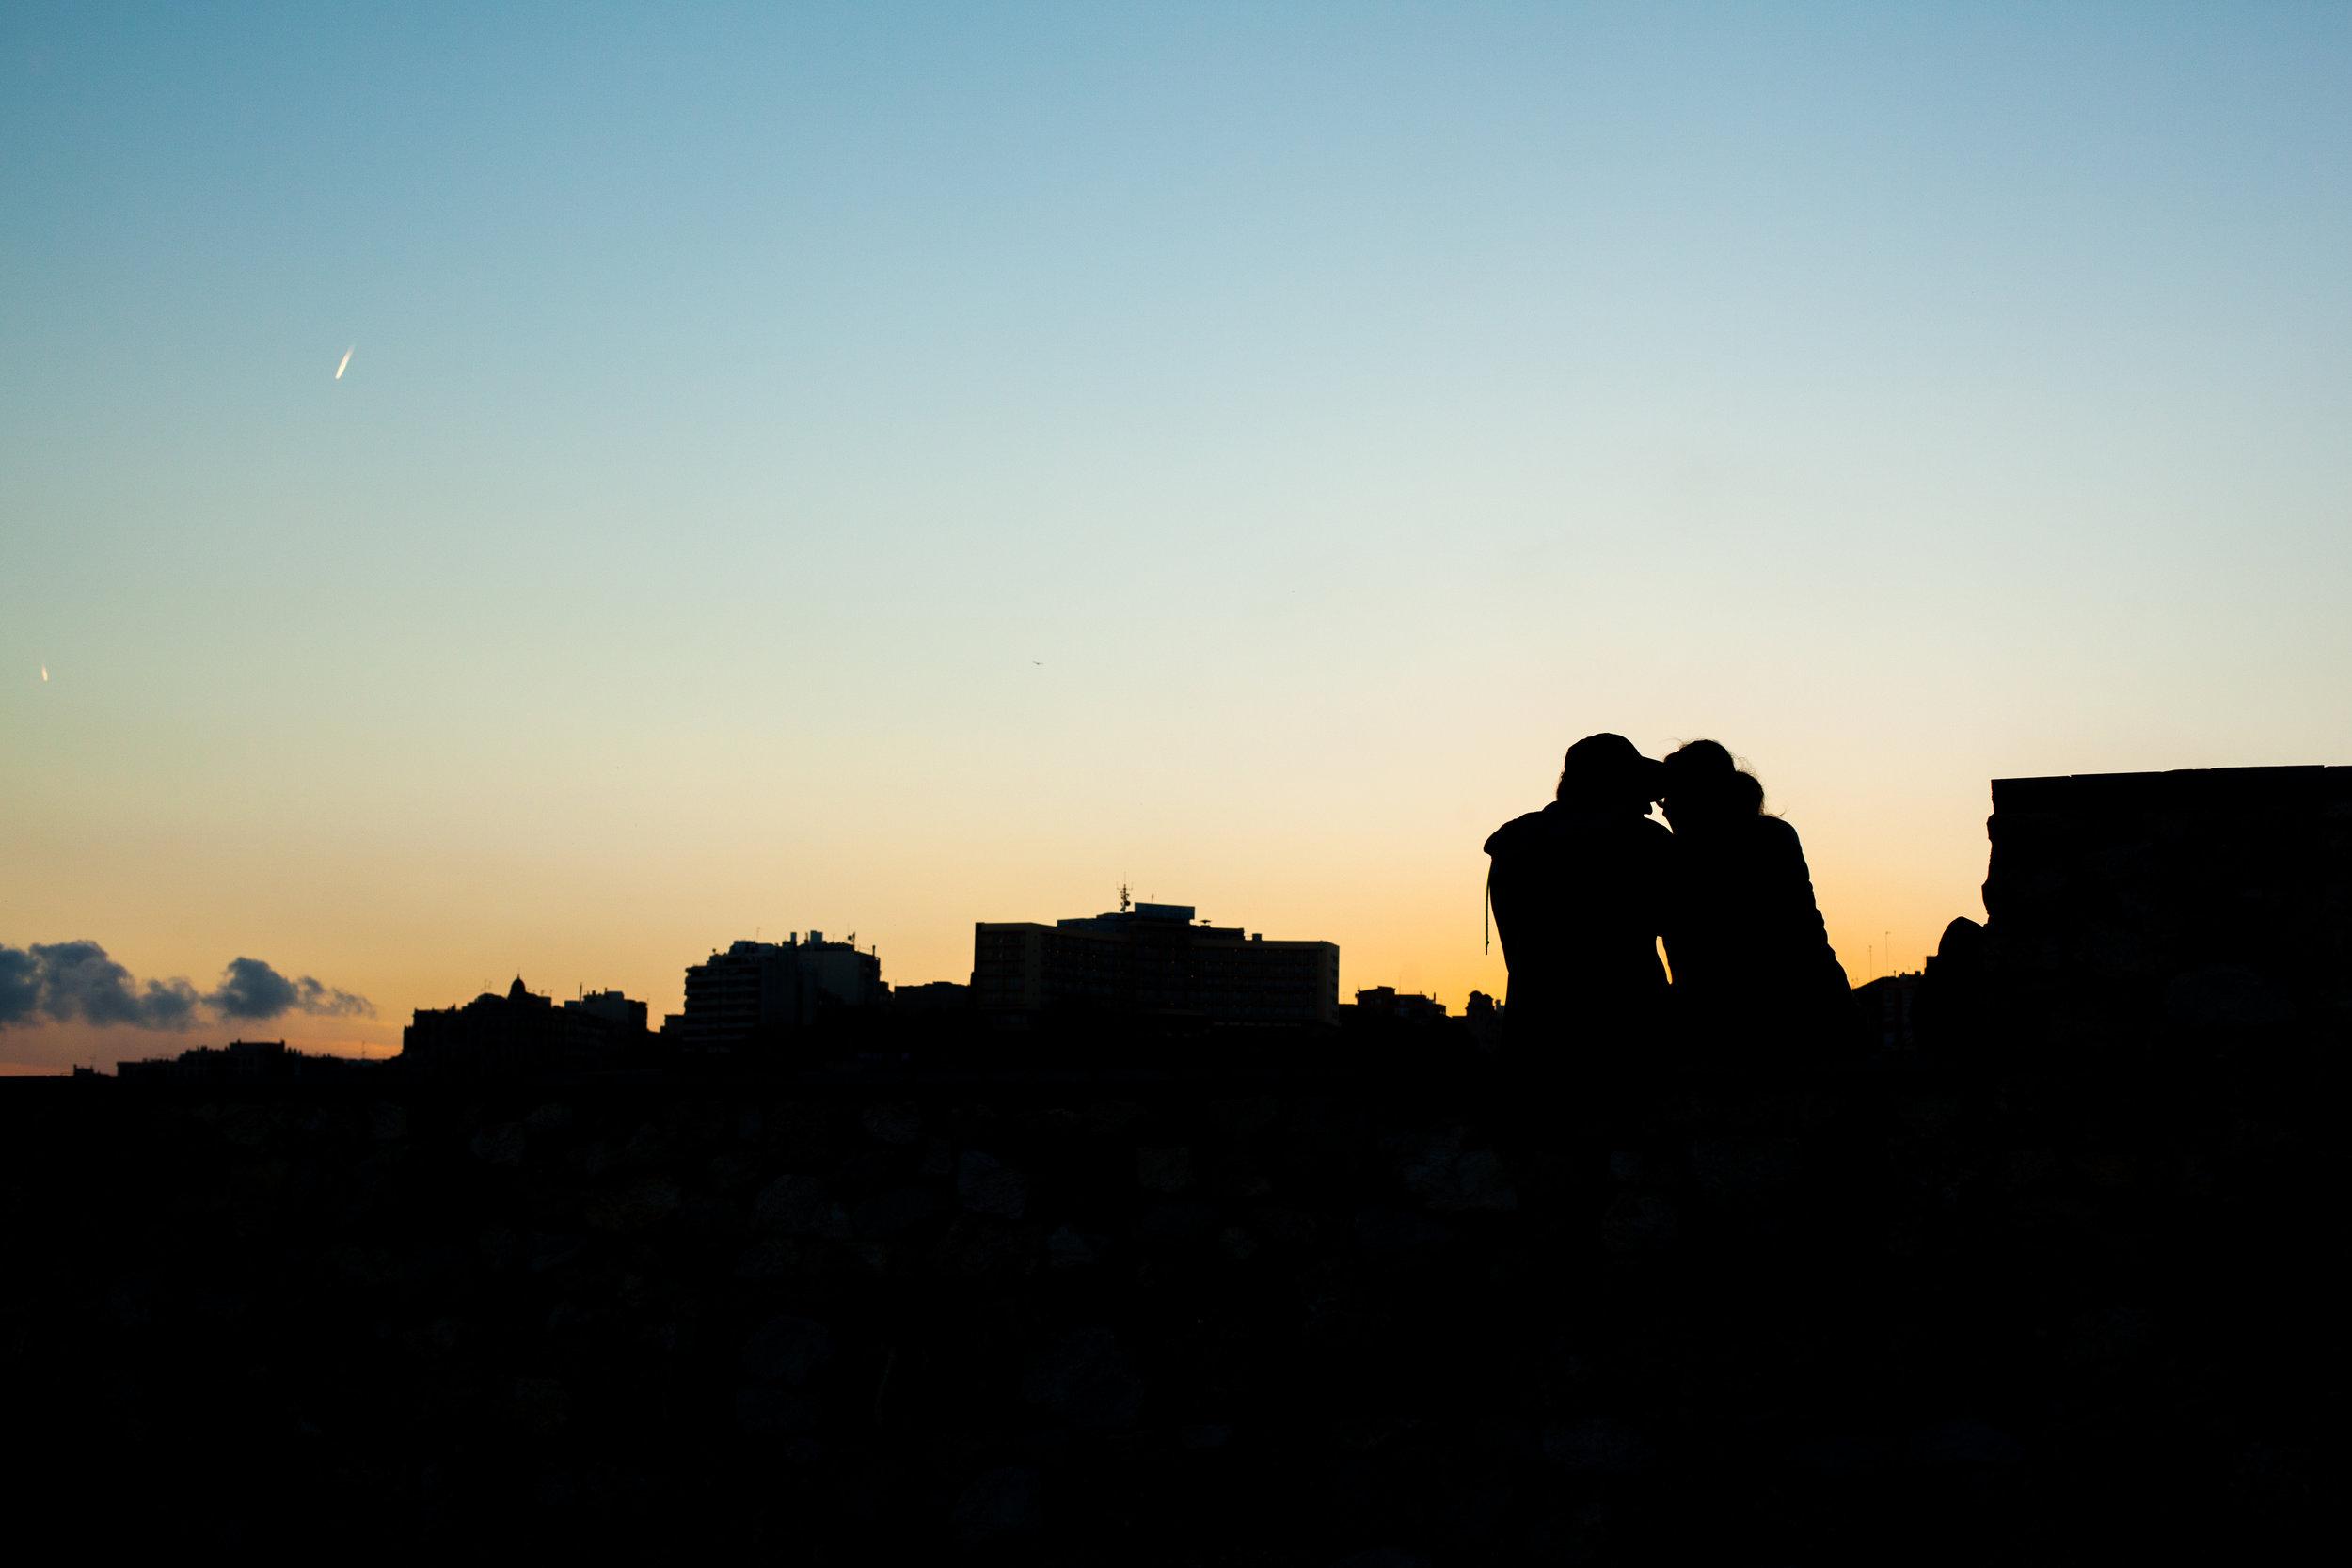 A romantic silhouette sunset shot in Tarragona, Catalonia.